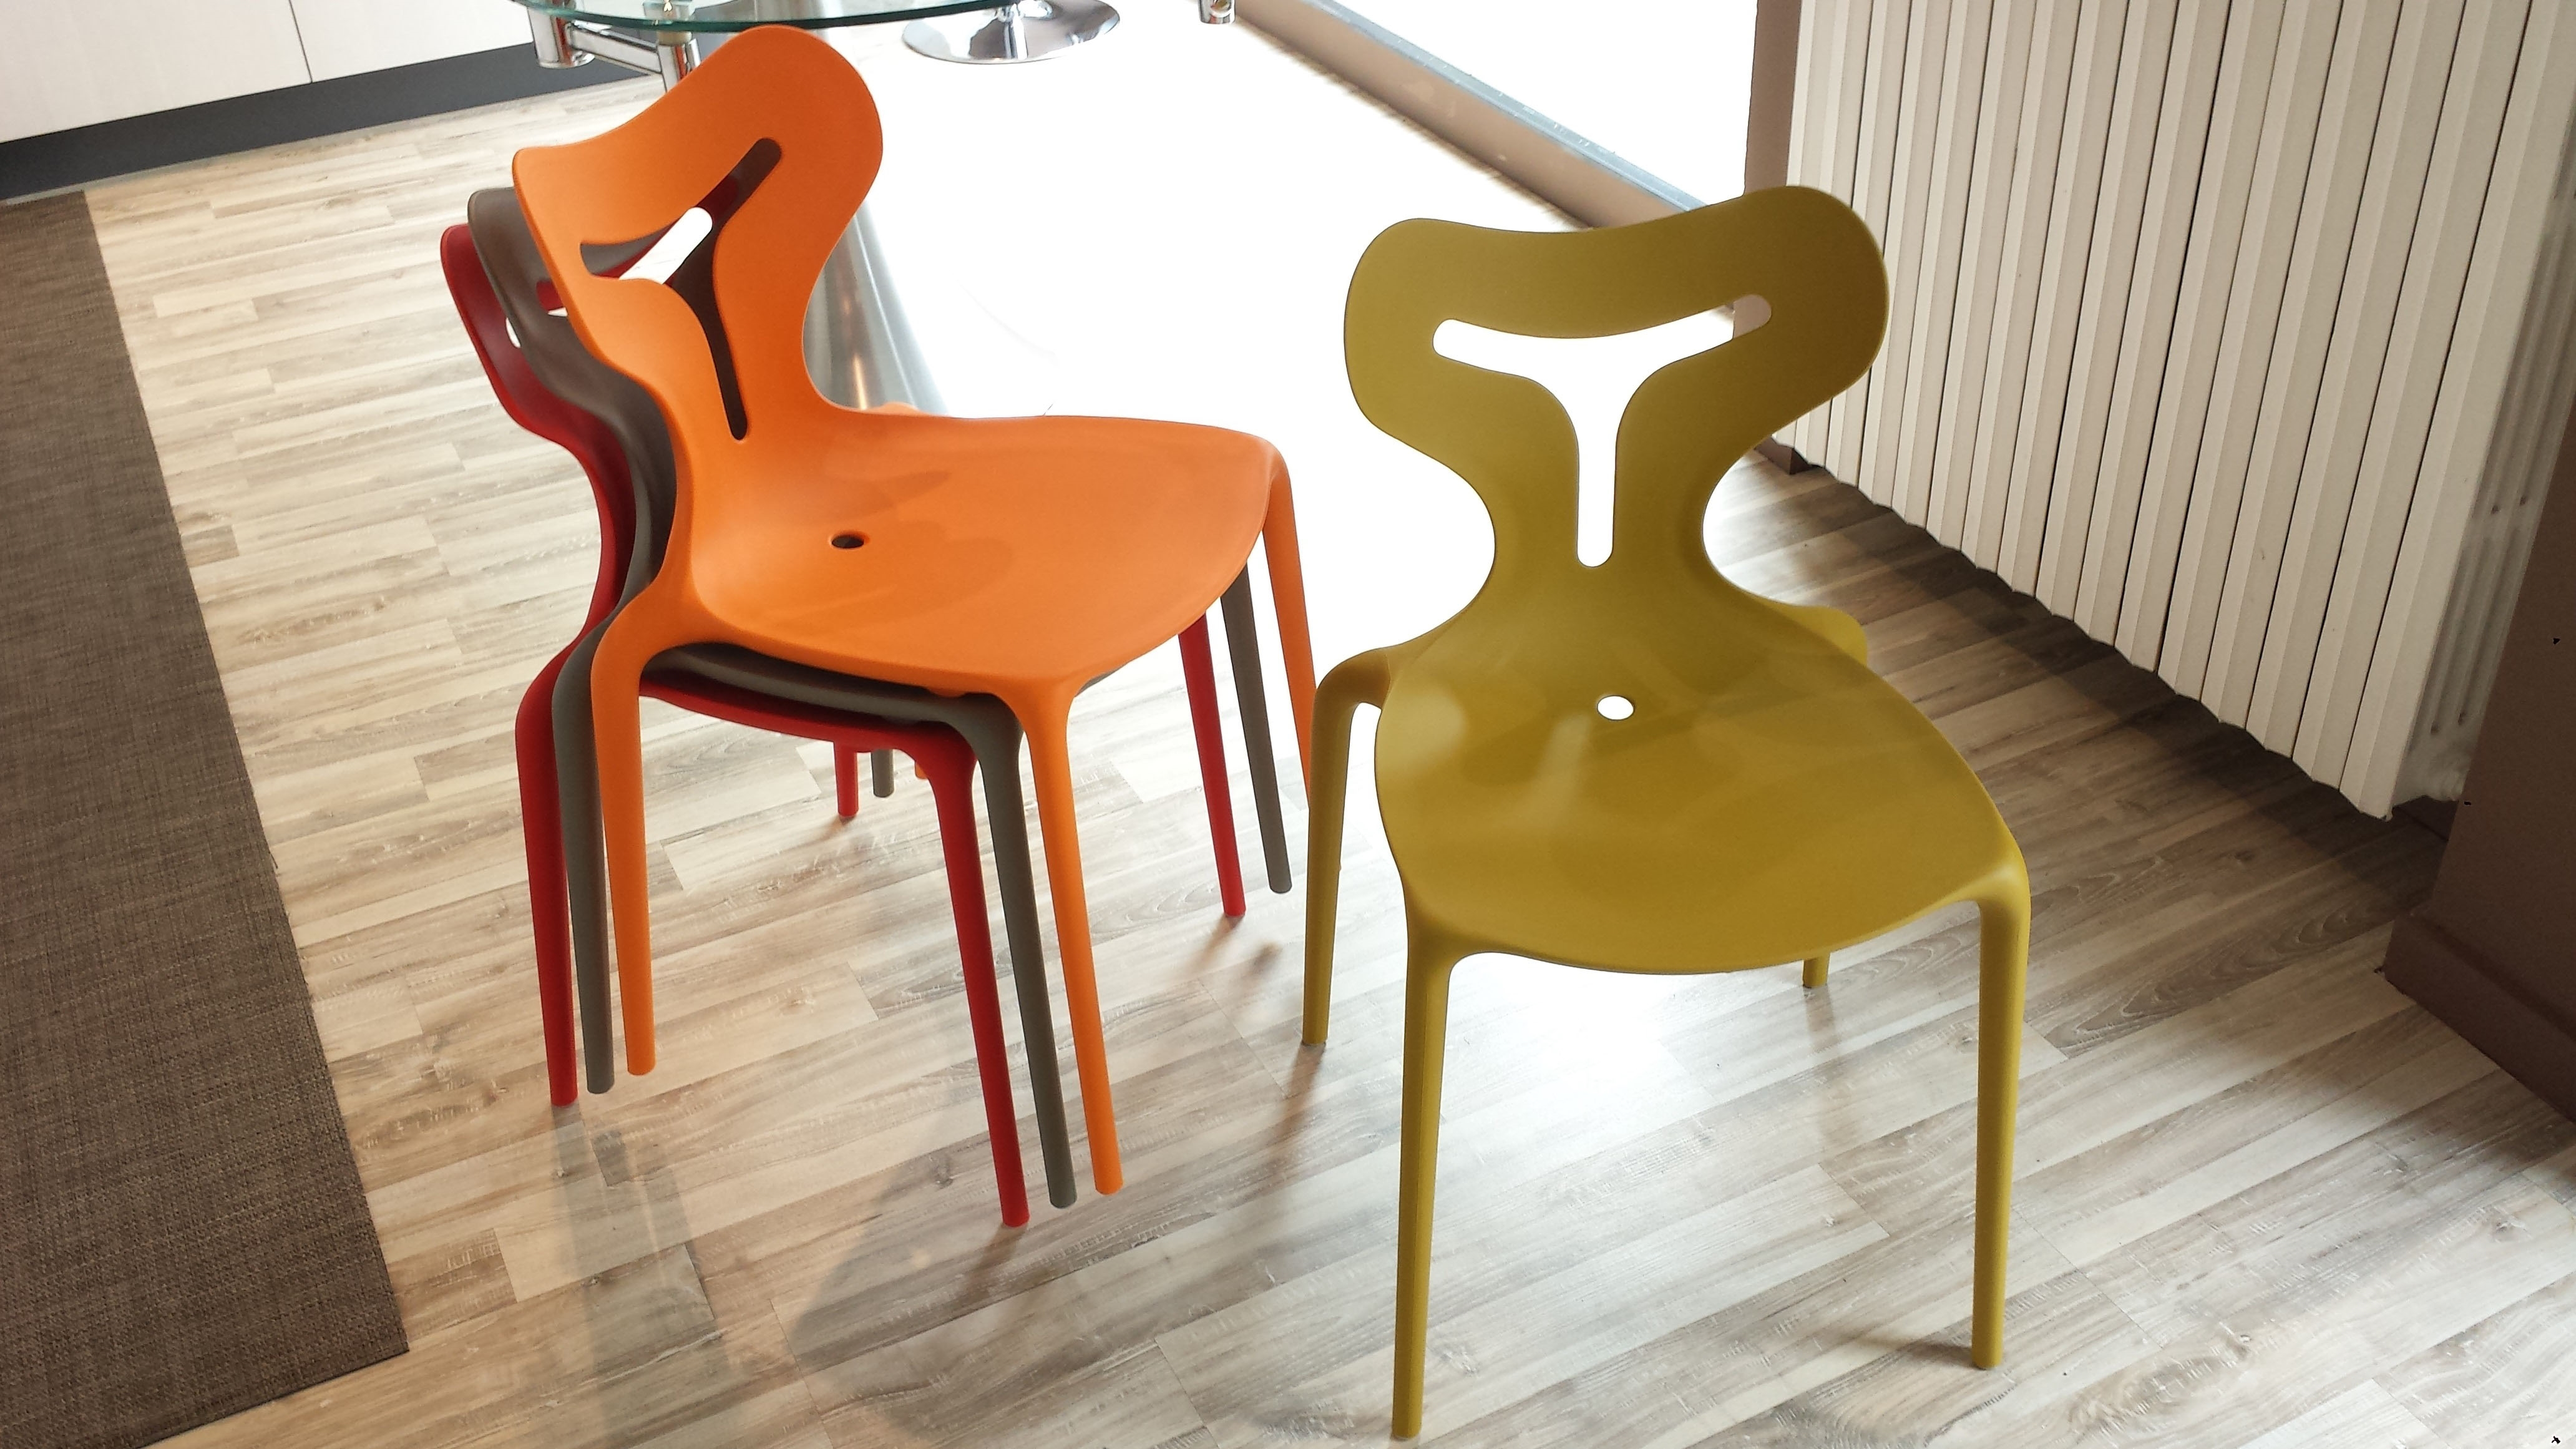 Sedie Rosse Calligaris : Sedie pieghevoli calligaris usate ~ bukadar.info = galleria di sedie